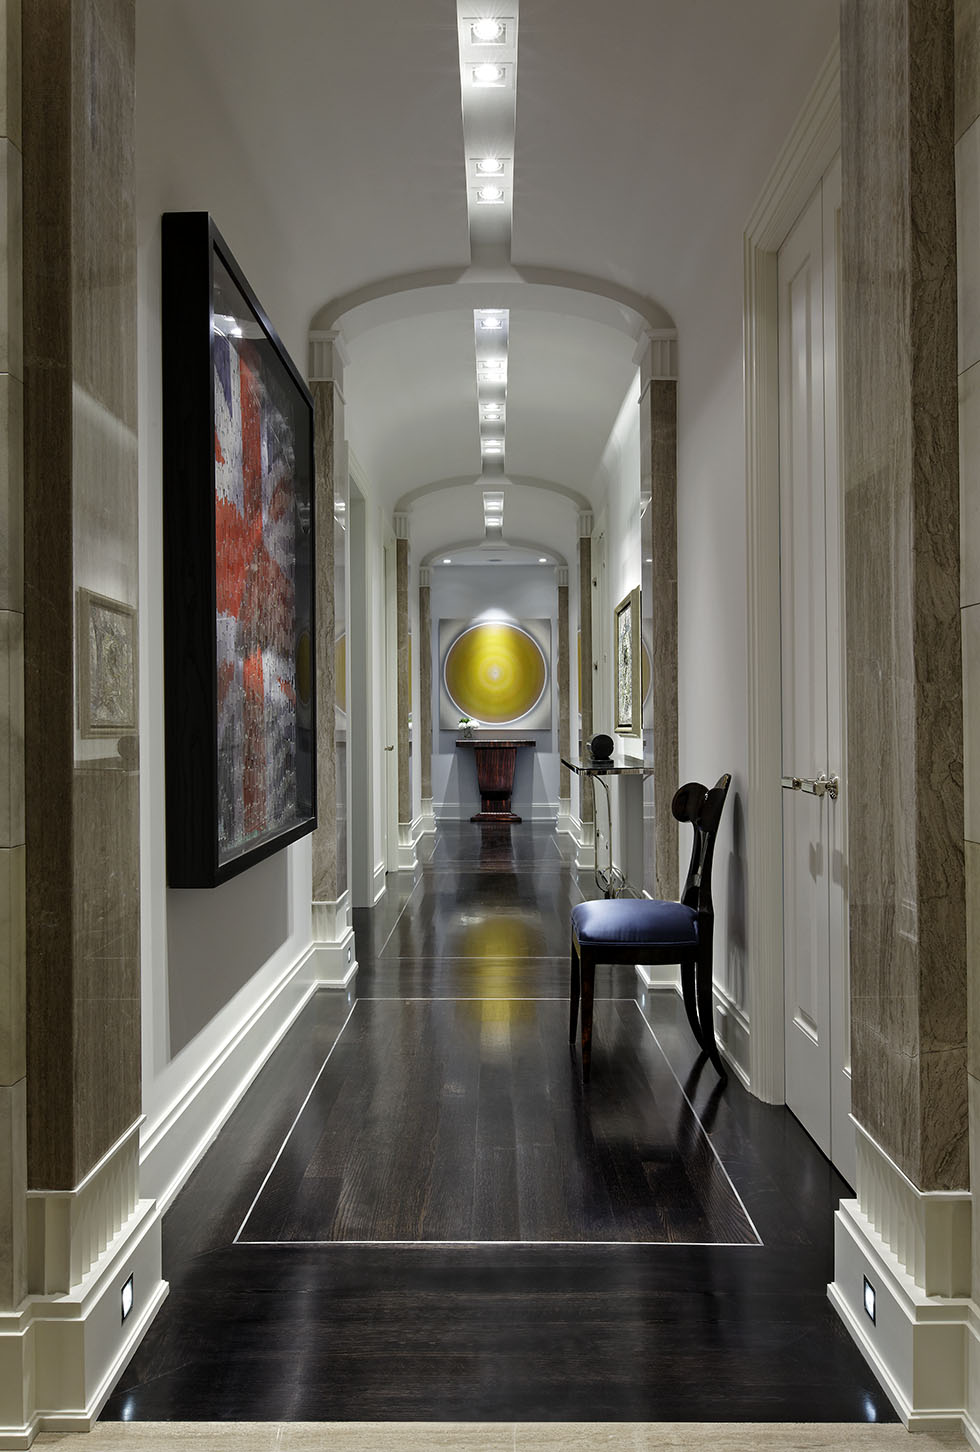 3_Hallway.jpg